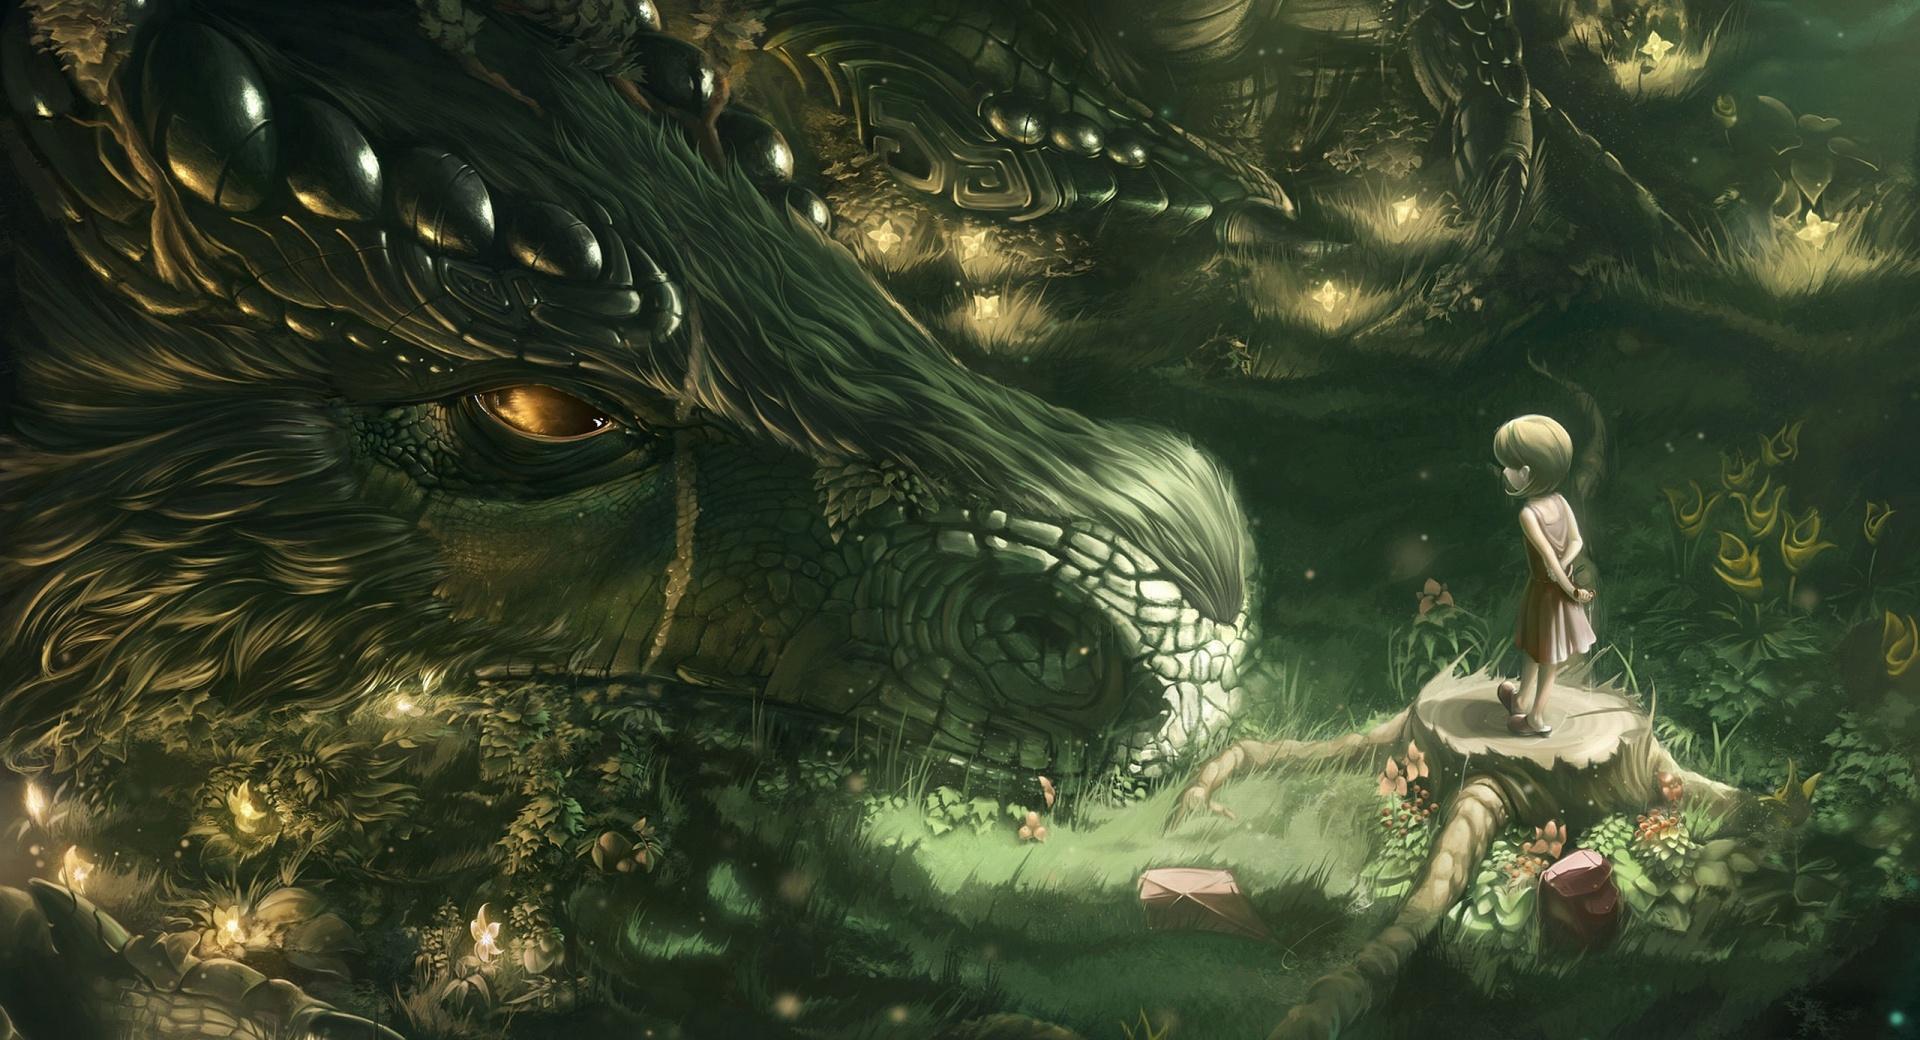 Fantasy Dragon wallpapers HD quality